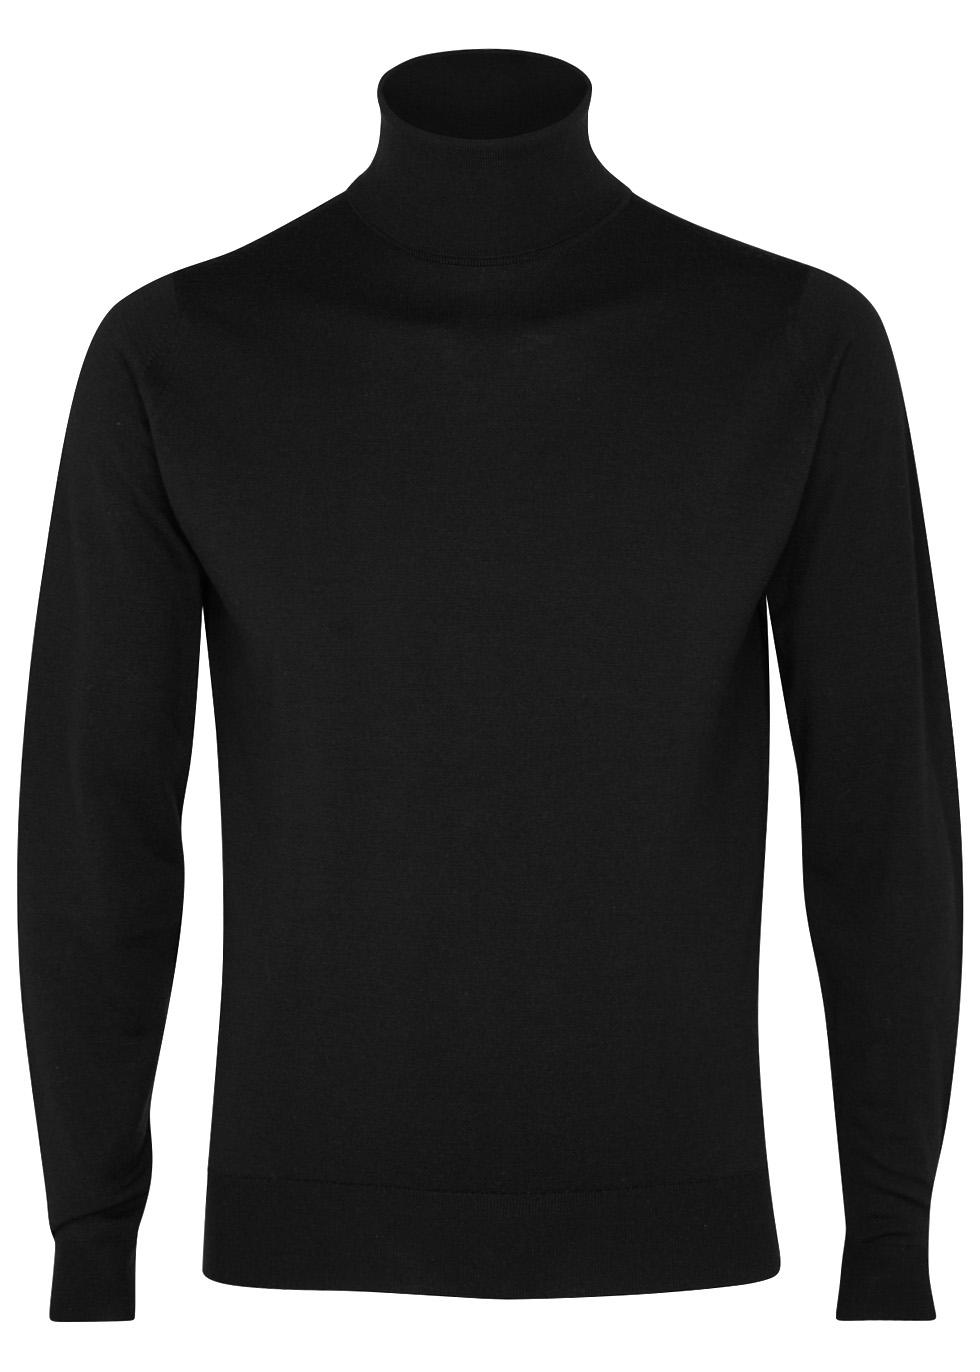 Cherwell black merino wool jumper - John Smedley